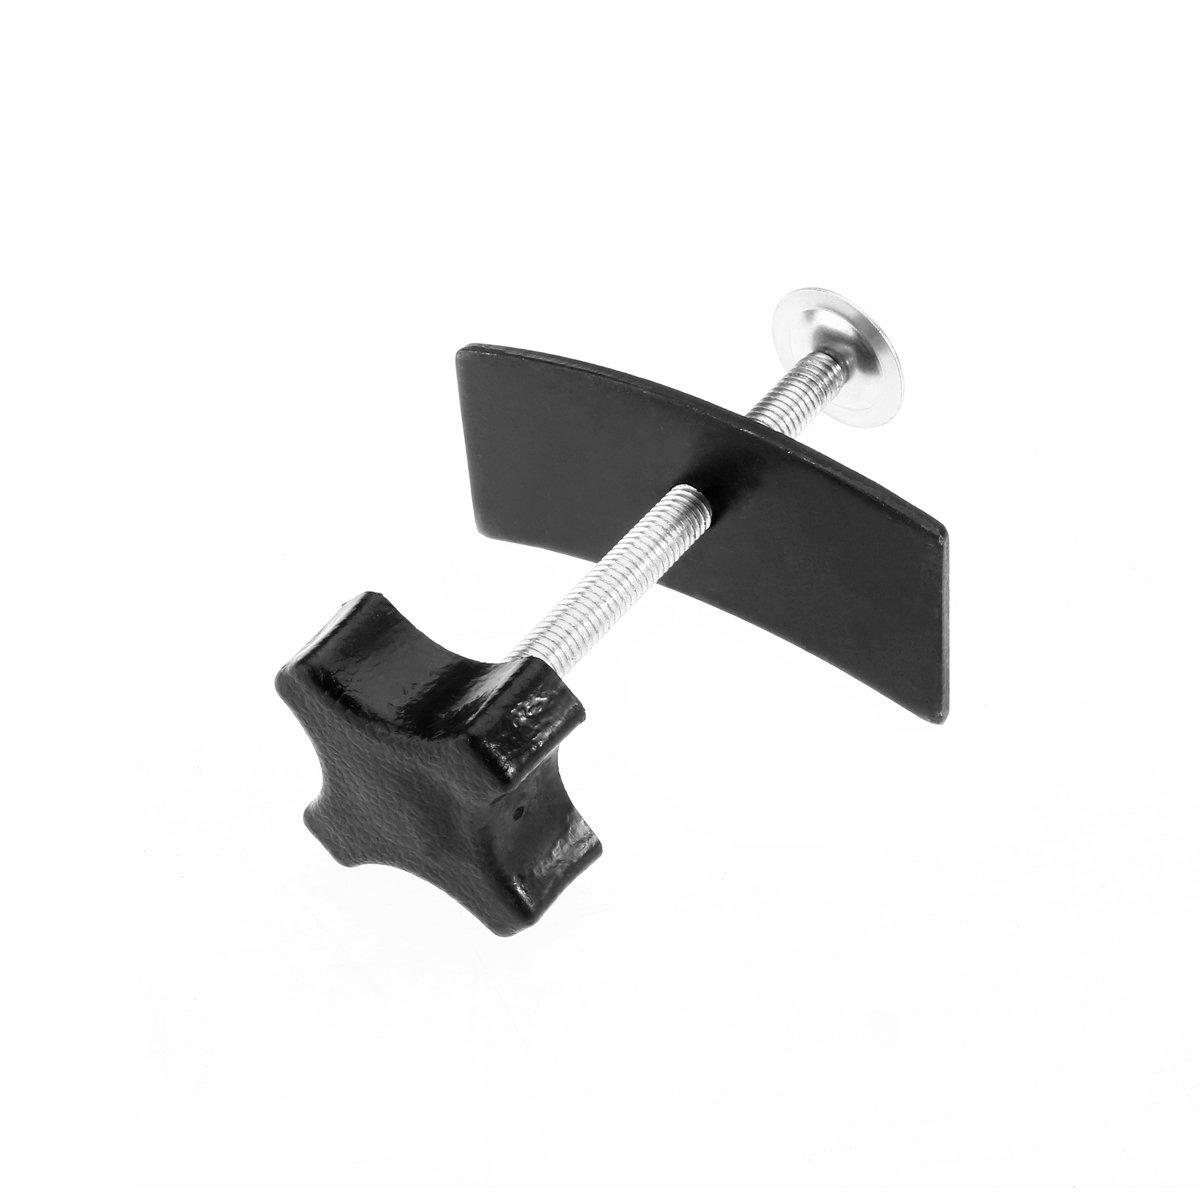 WINOMO Auto Disc Brake Pad Spreader Ergonomic Disc Brake Tool for Car Truck Van Rv